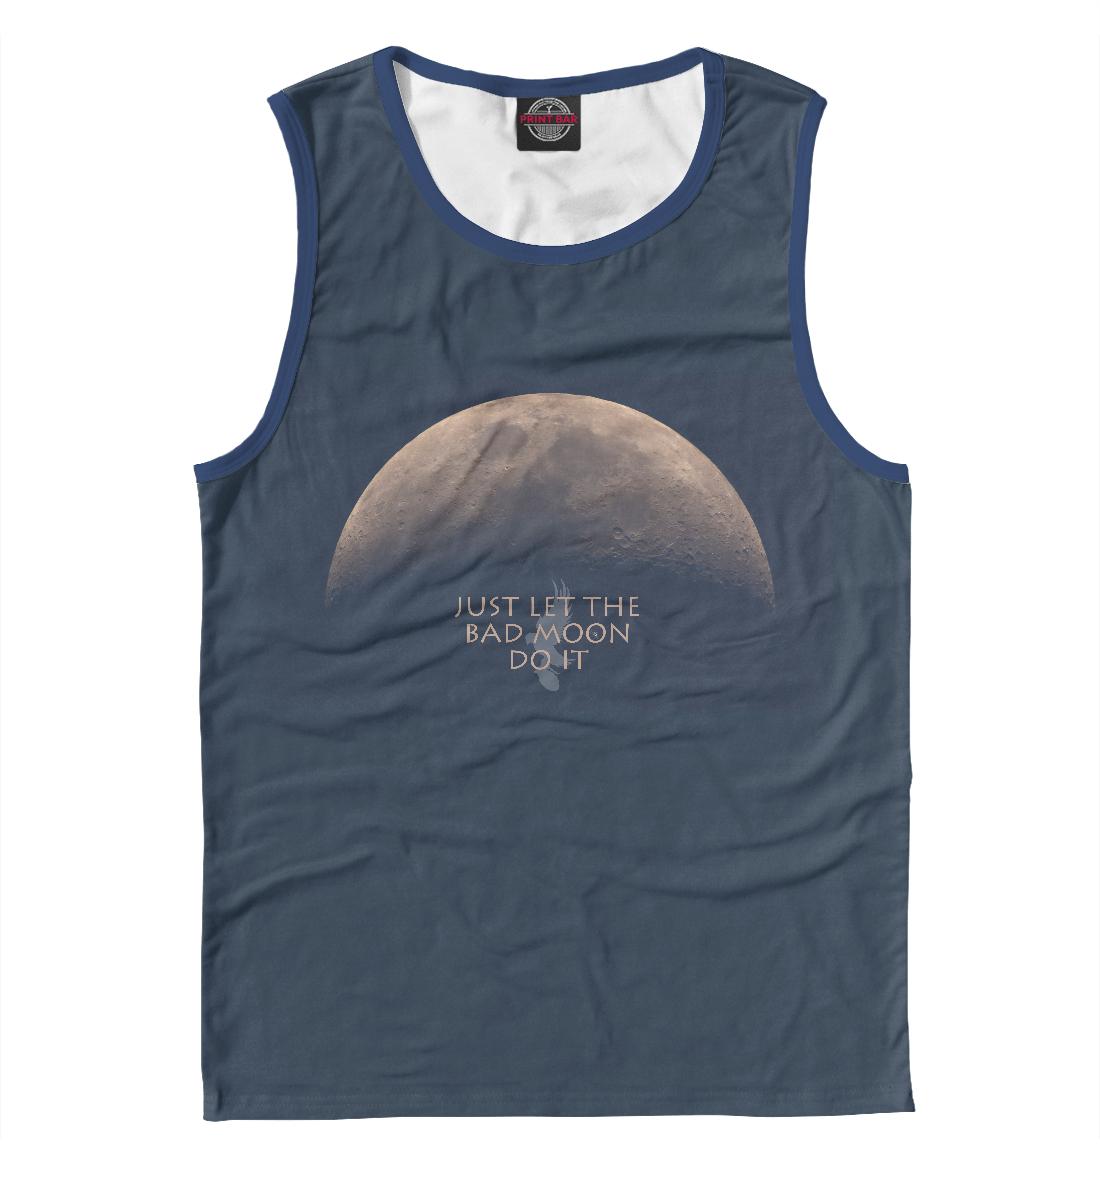 Купить Hollywood Undead Bad Moon, Printbar, Майки, HLW-581197-may-2